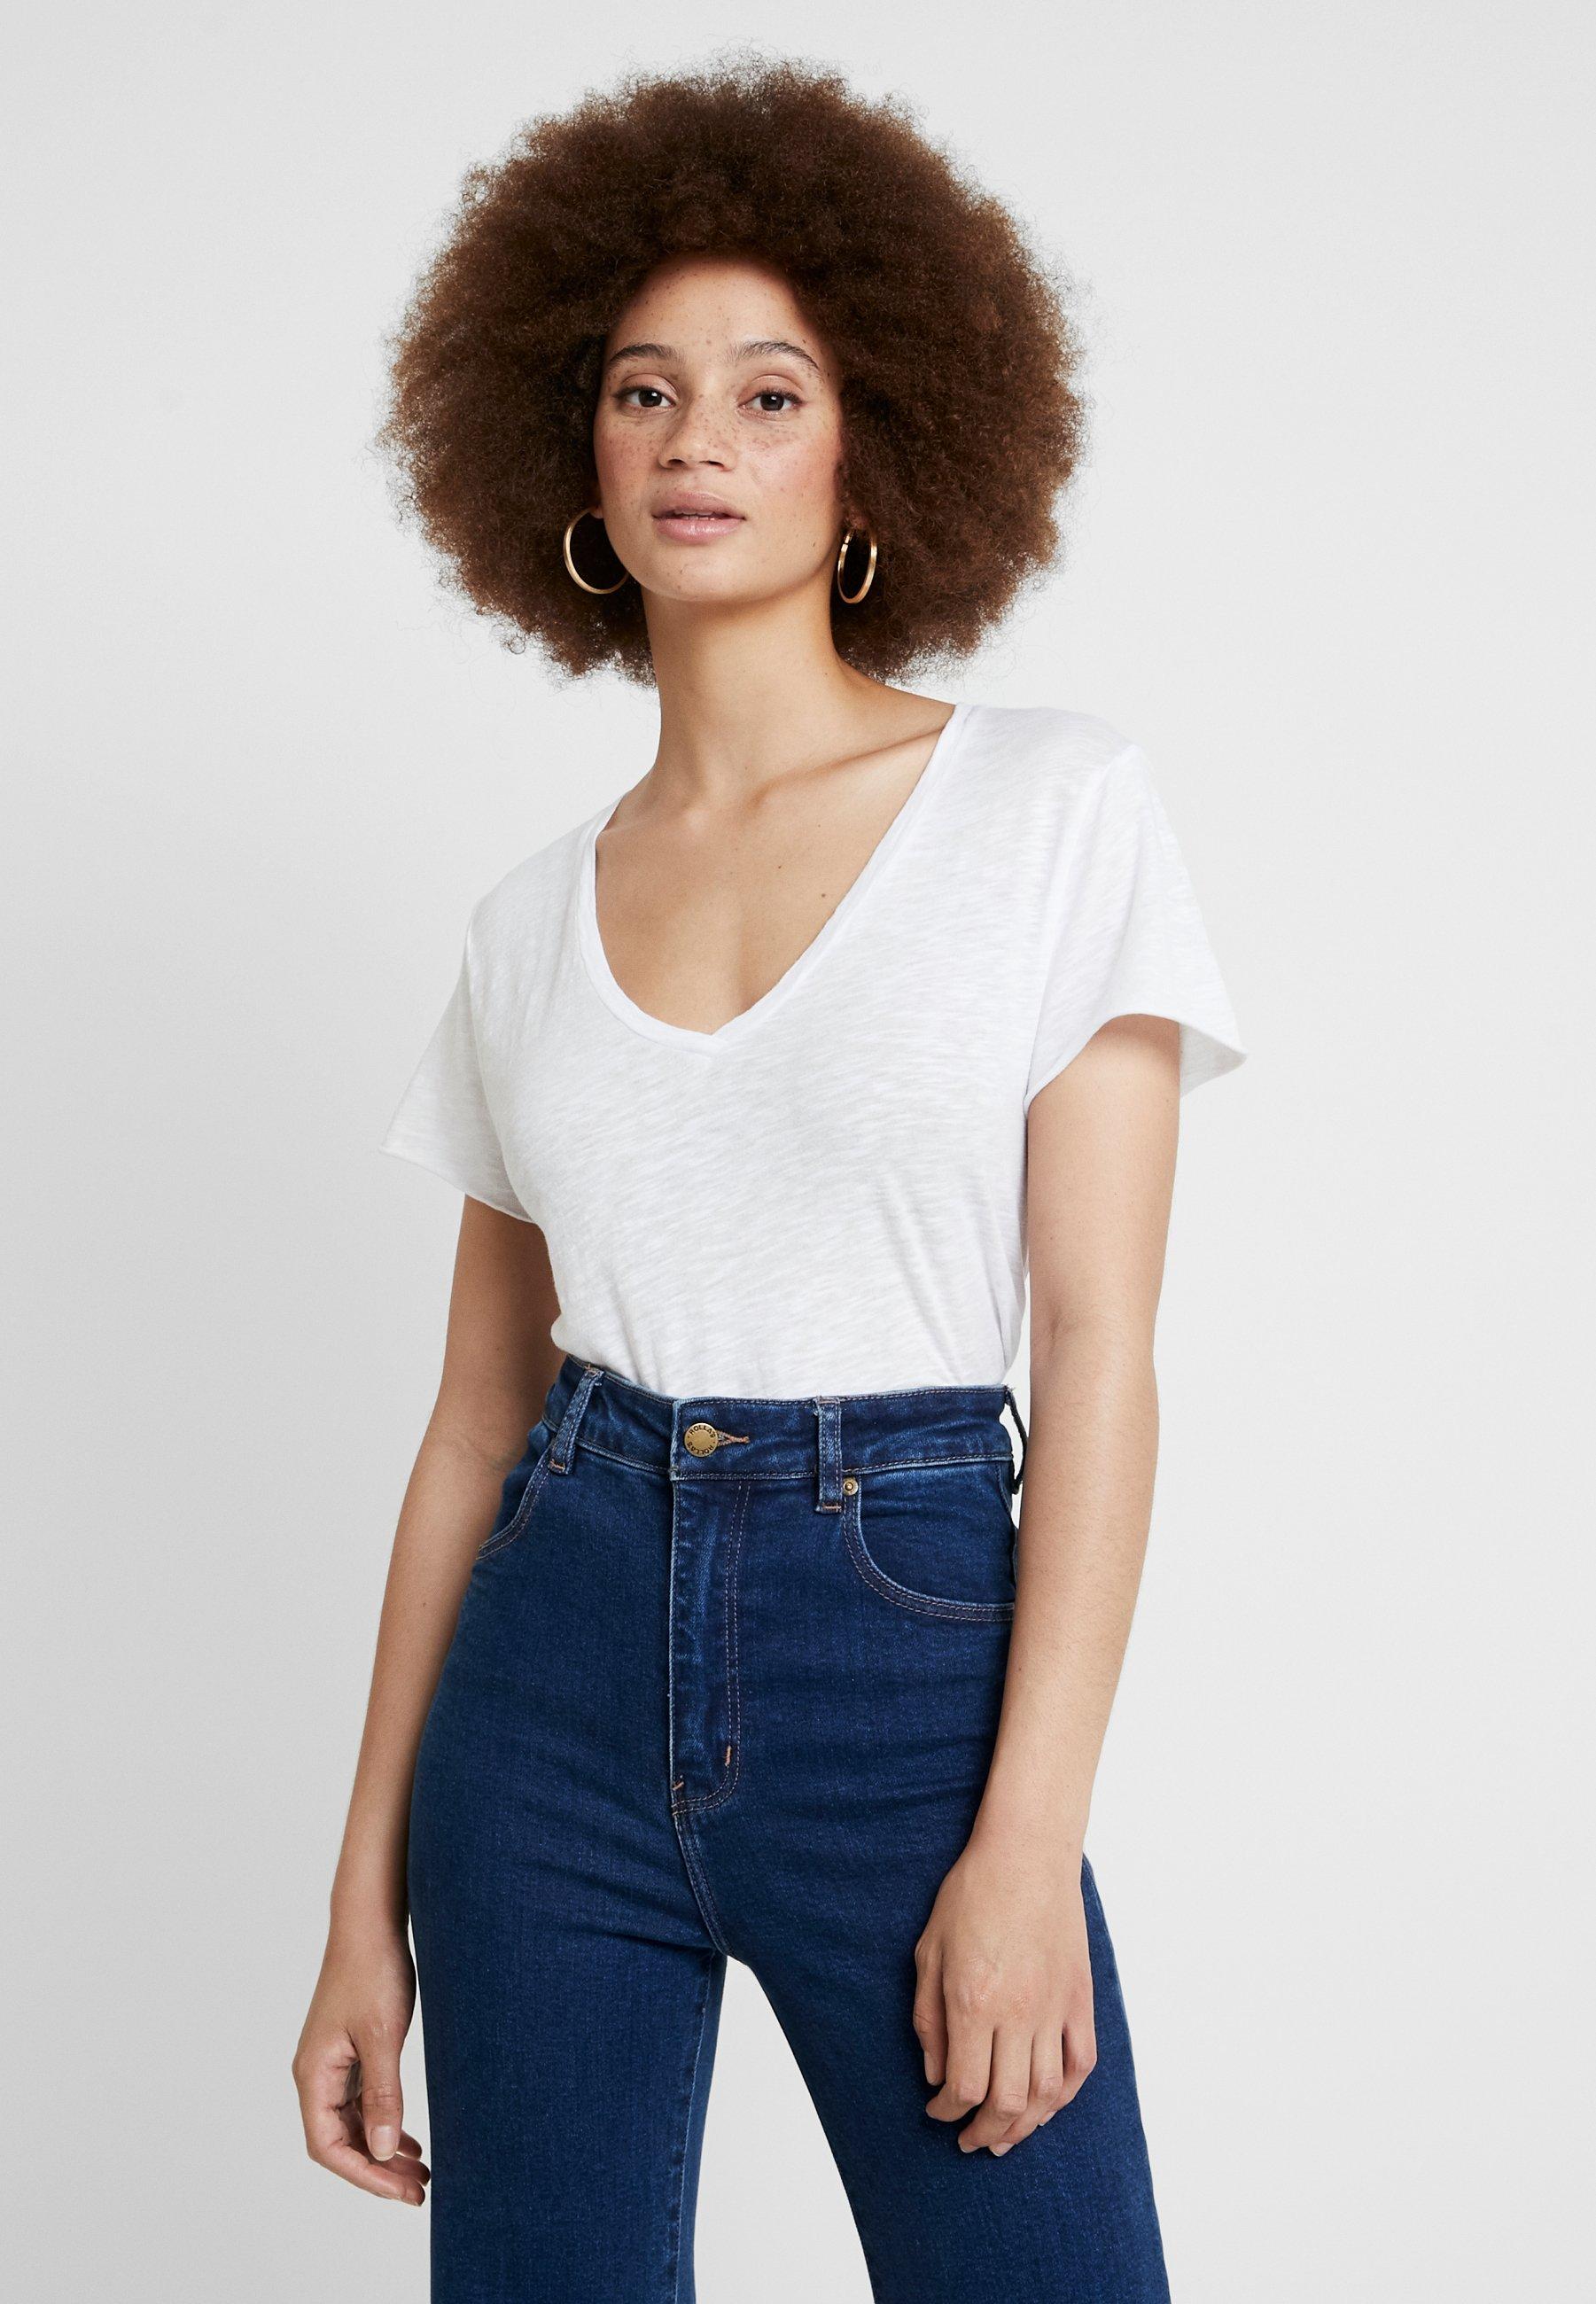 Basique American Vintage shirt Blanc KobibayT iuZOPkX